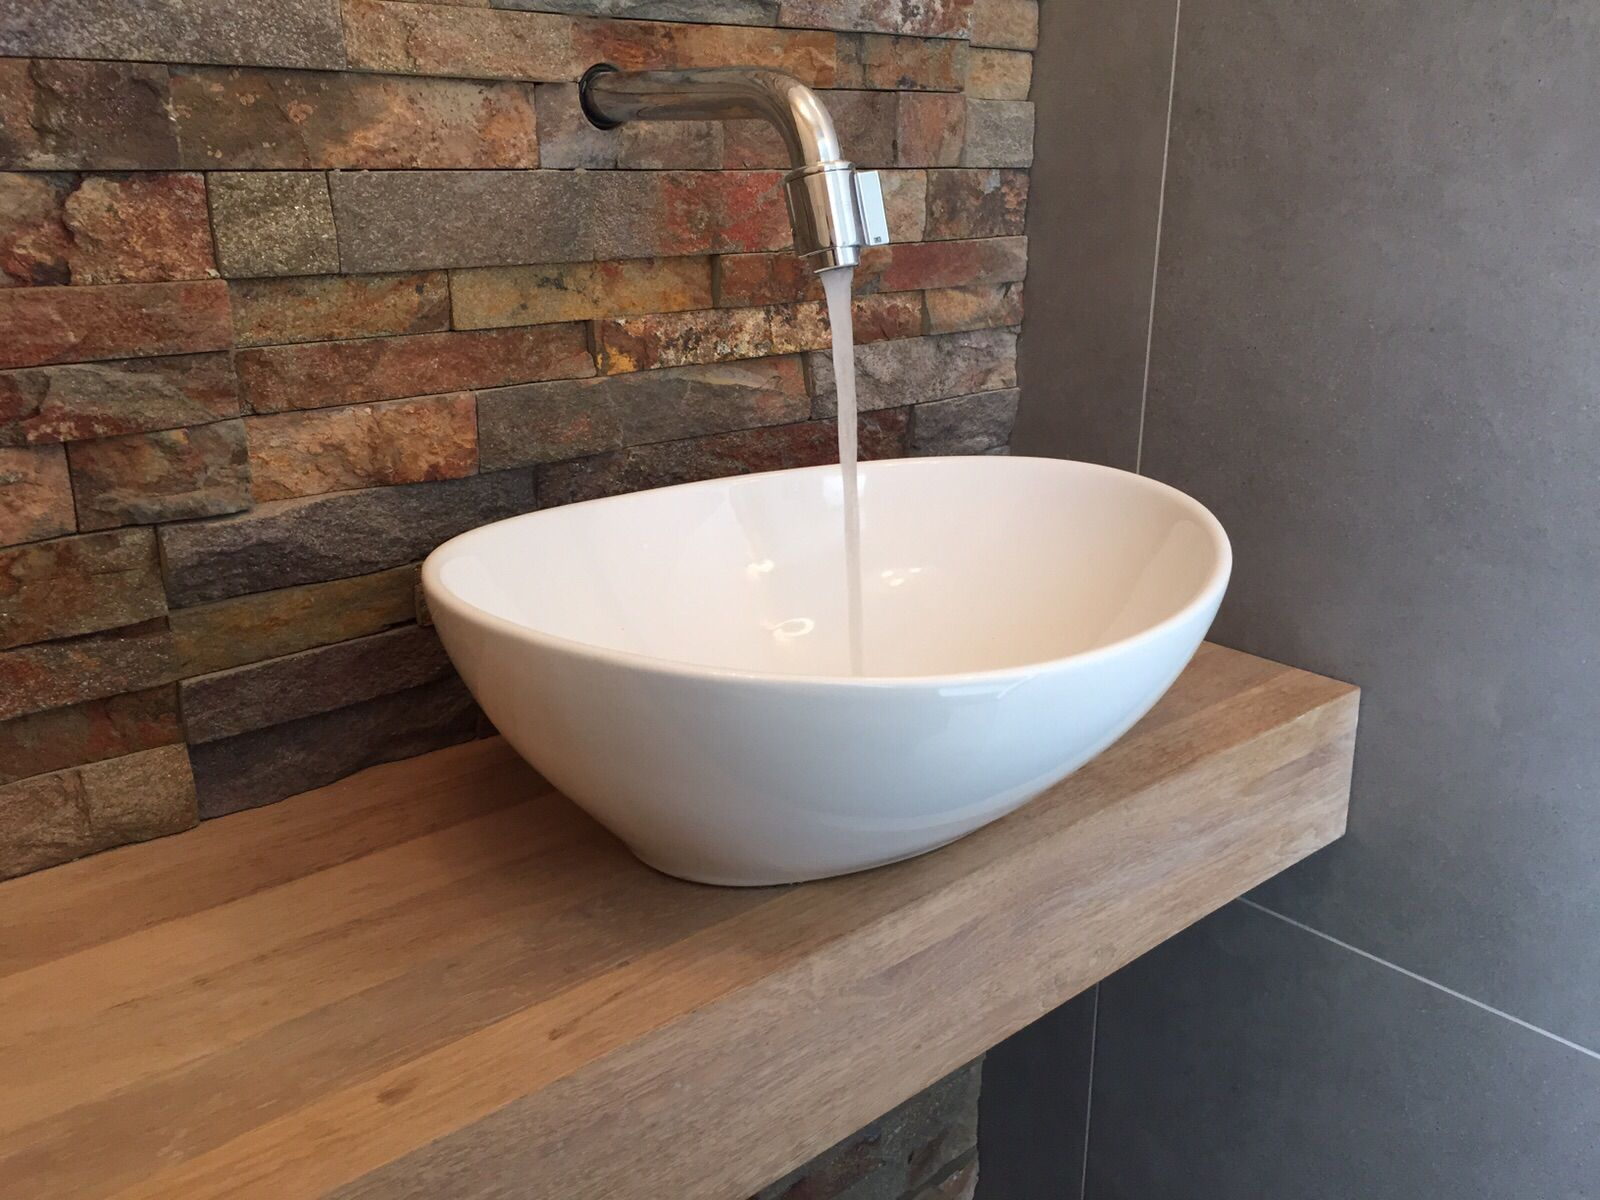 Fontein Natuursteen Toilet : Natuursteen bricks houten plank en opzet fontein toiletten